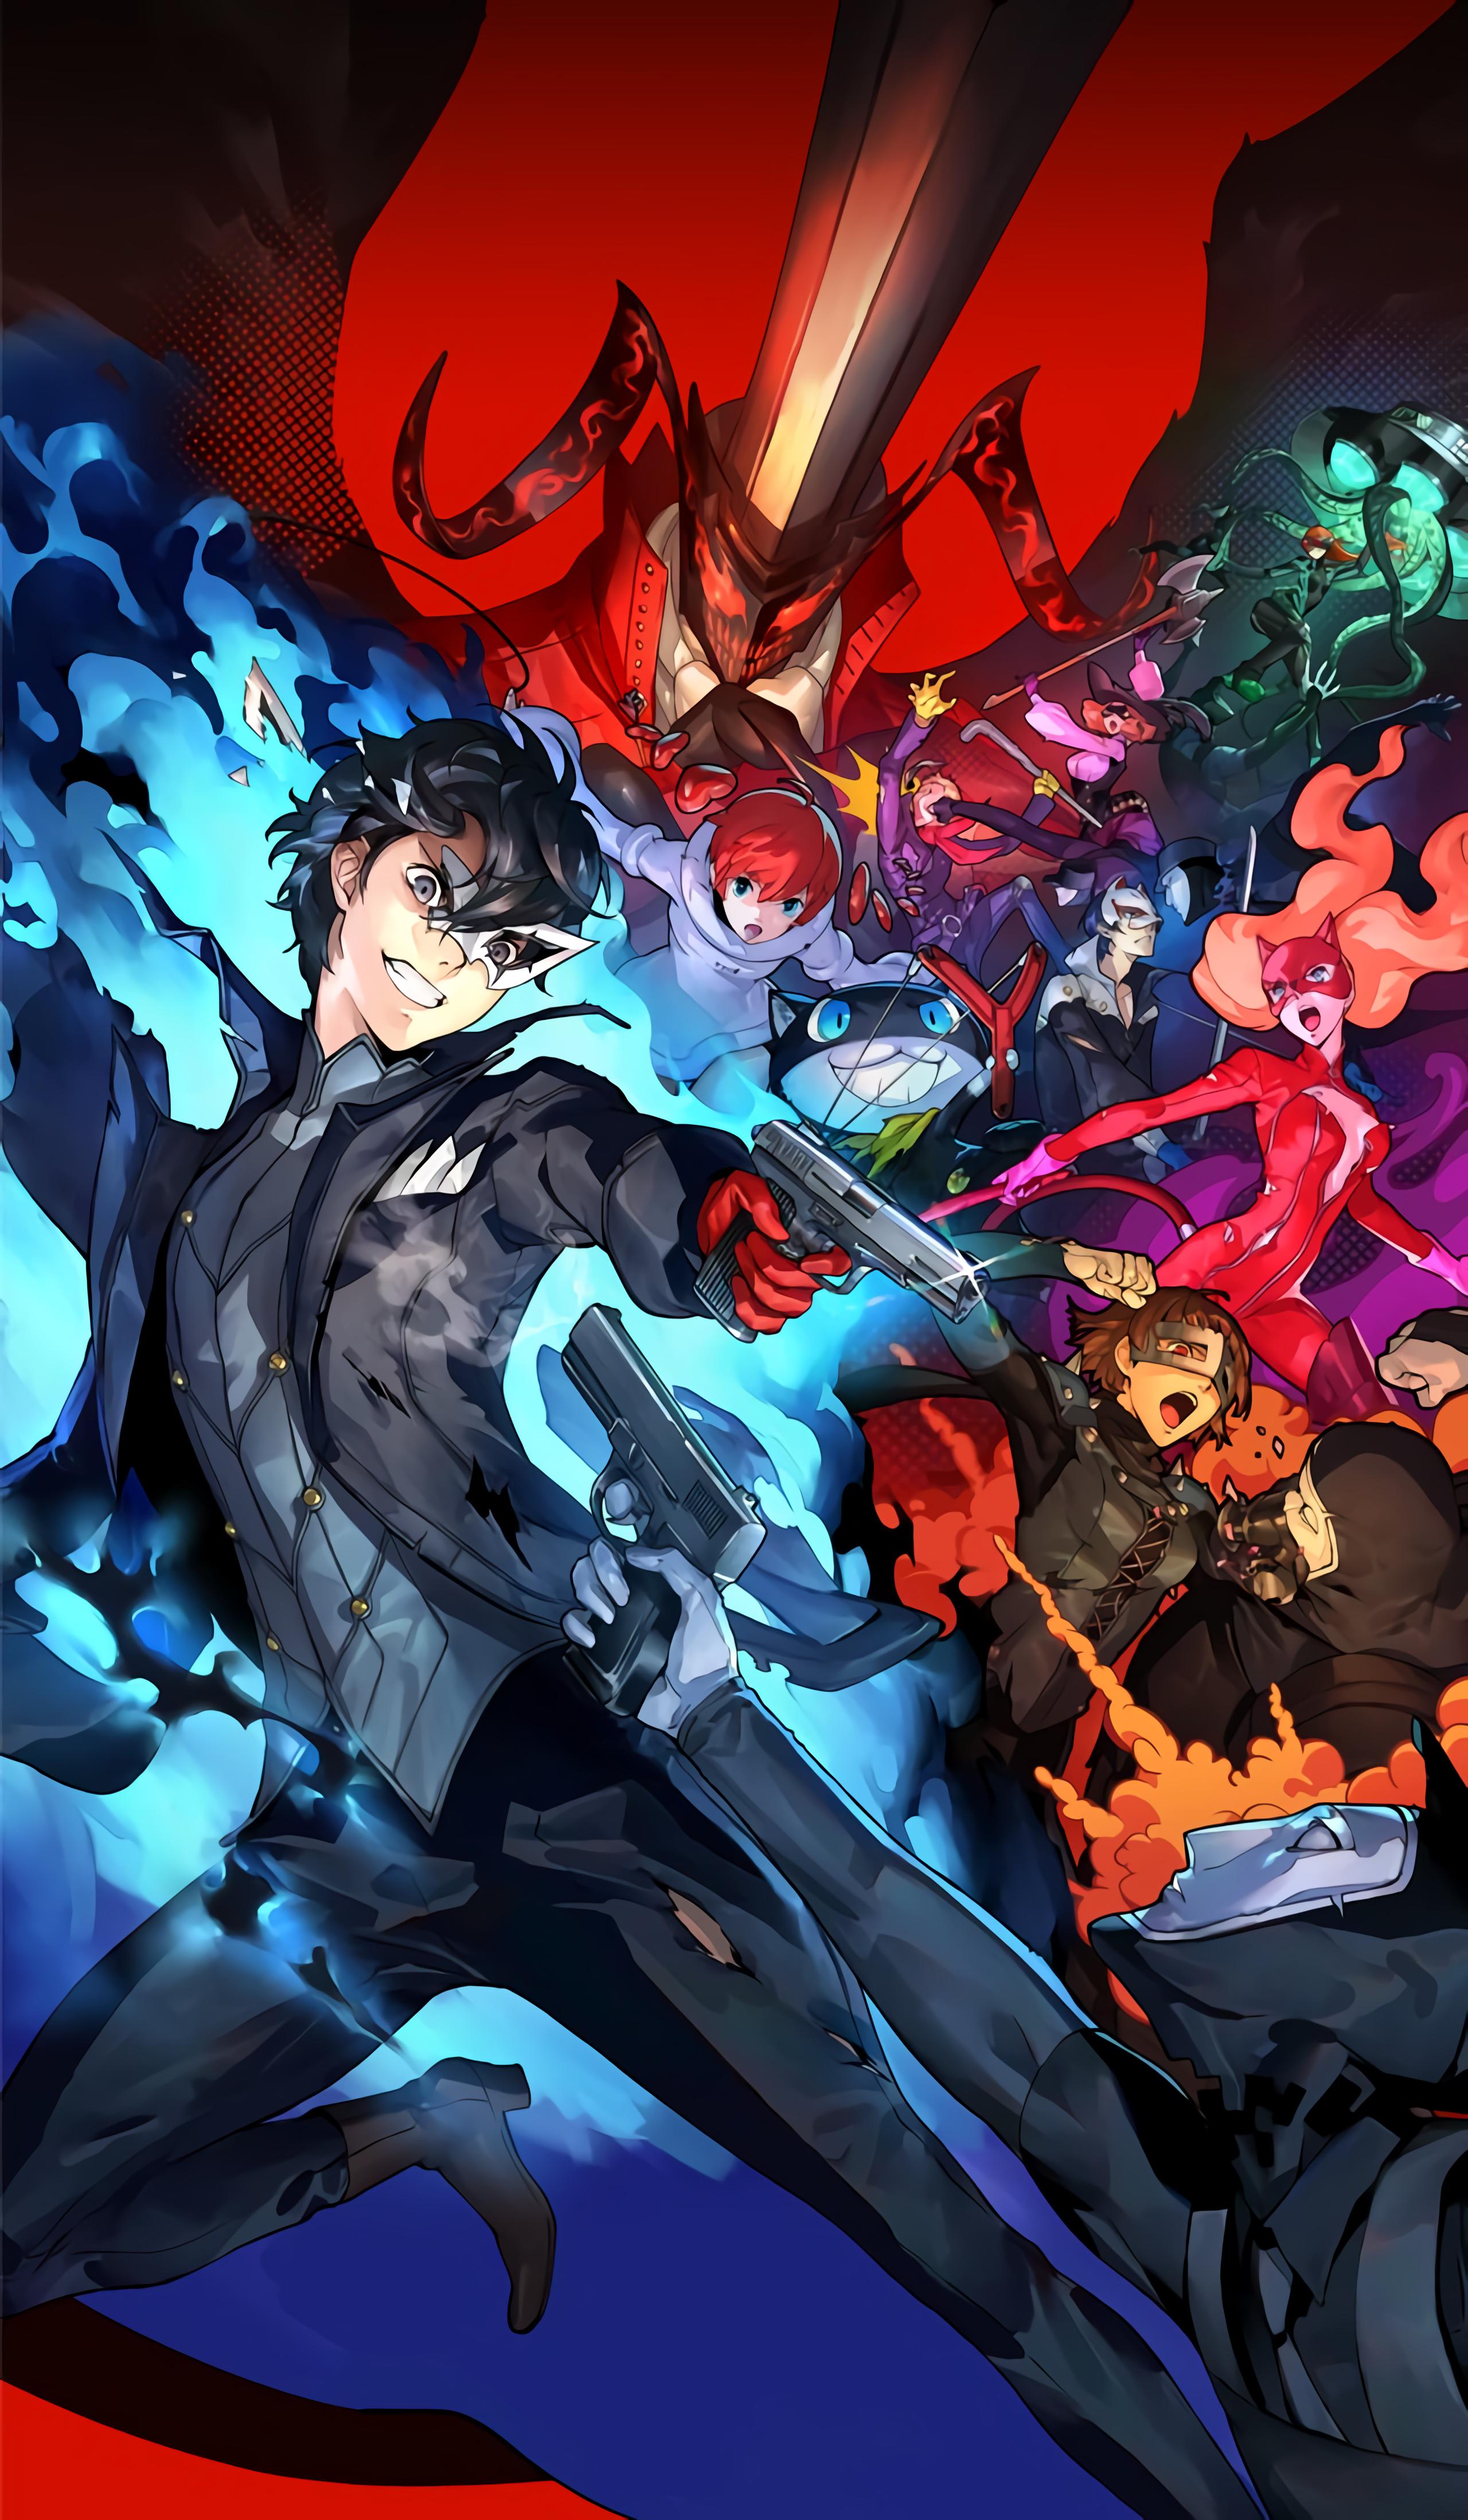 Persona 5 Phone Wallpapers - Wallpaper Cave